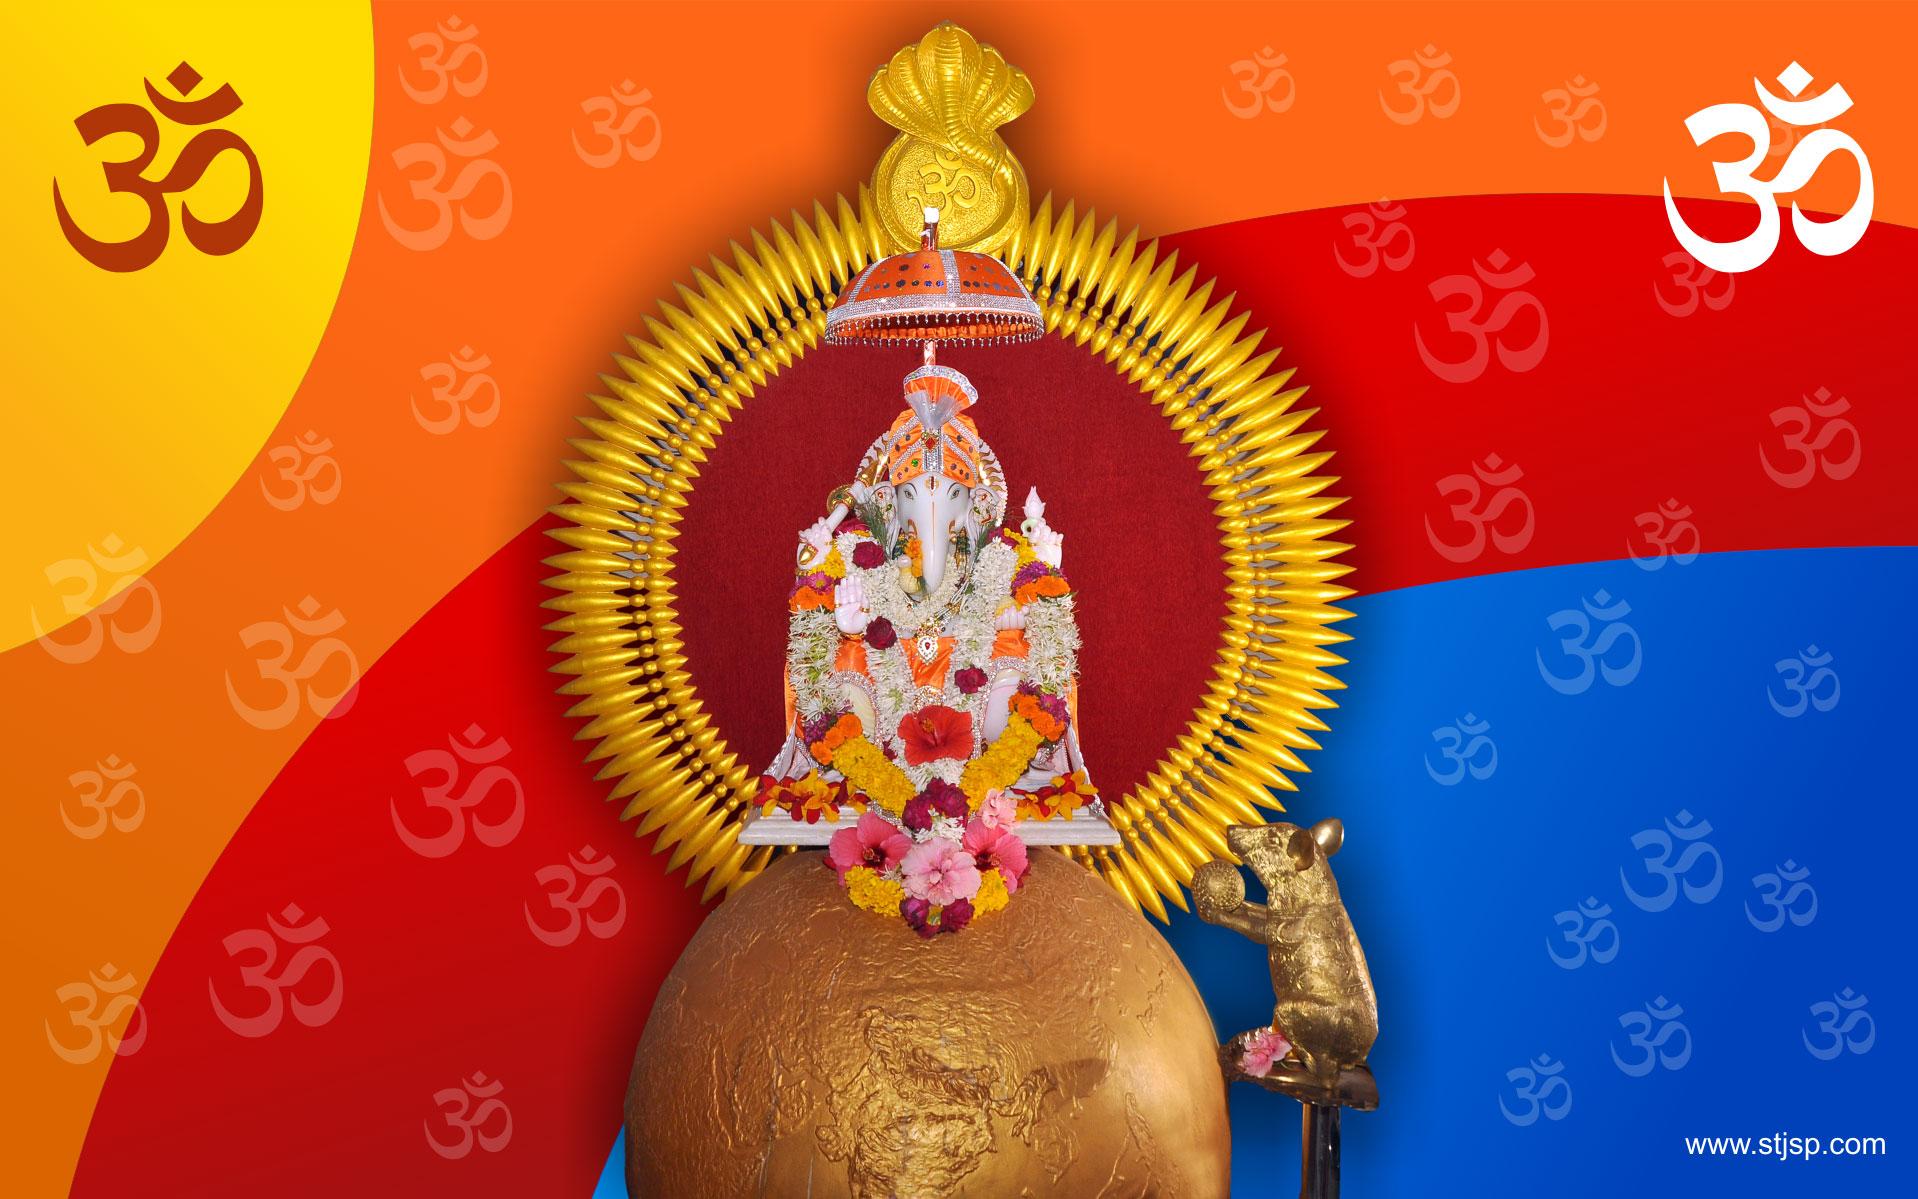 Great Wallpaper Lord Siddhivinayak - w3  Snapshot_46845.jpg